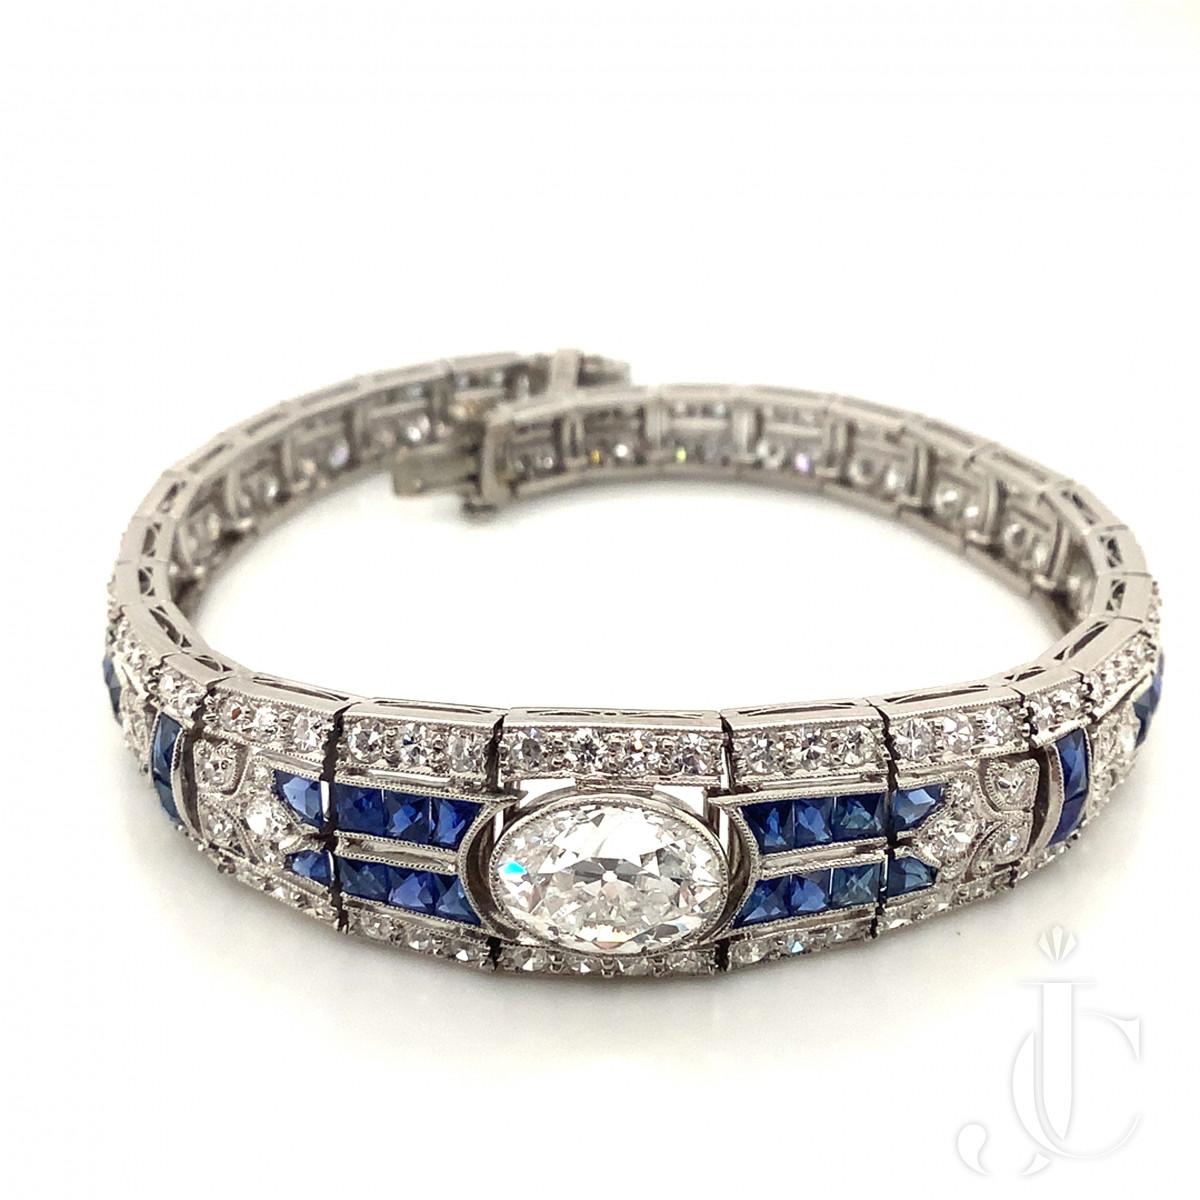 JE Caldwell Art Deco Diamond Bracelet